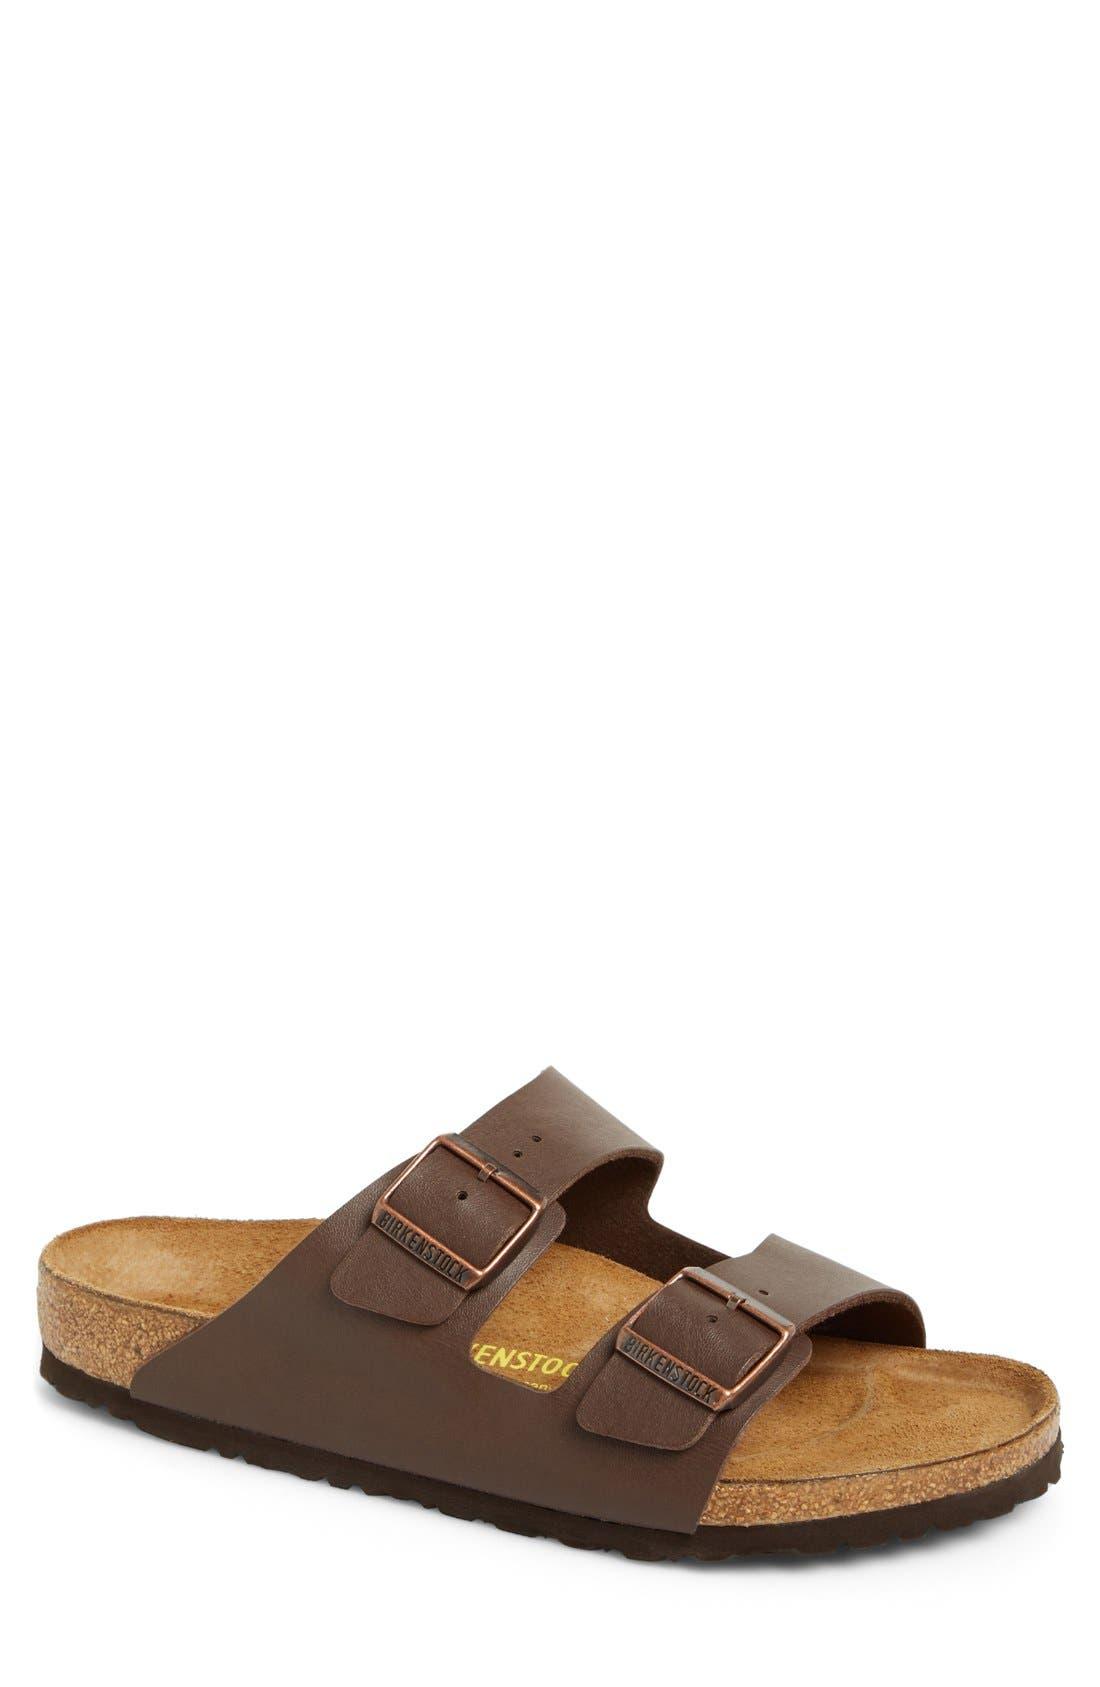 Main Image - Birkenstock 'Arizona' Slide Sandal (Men)